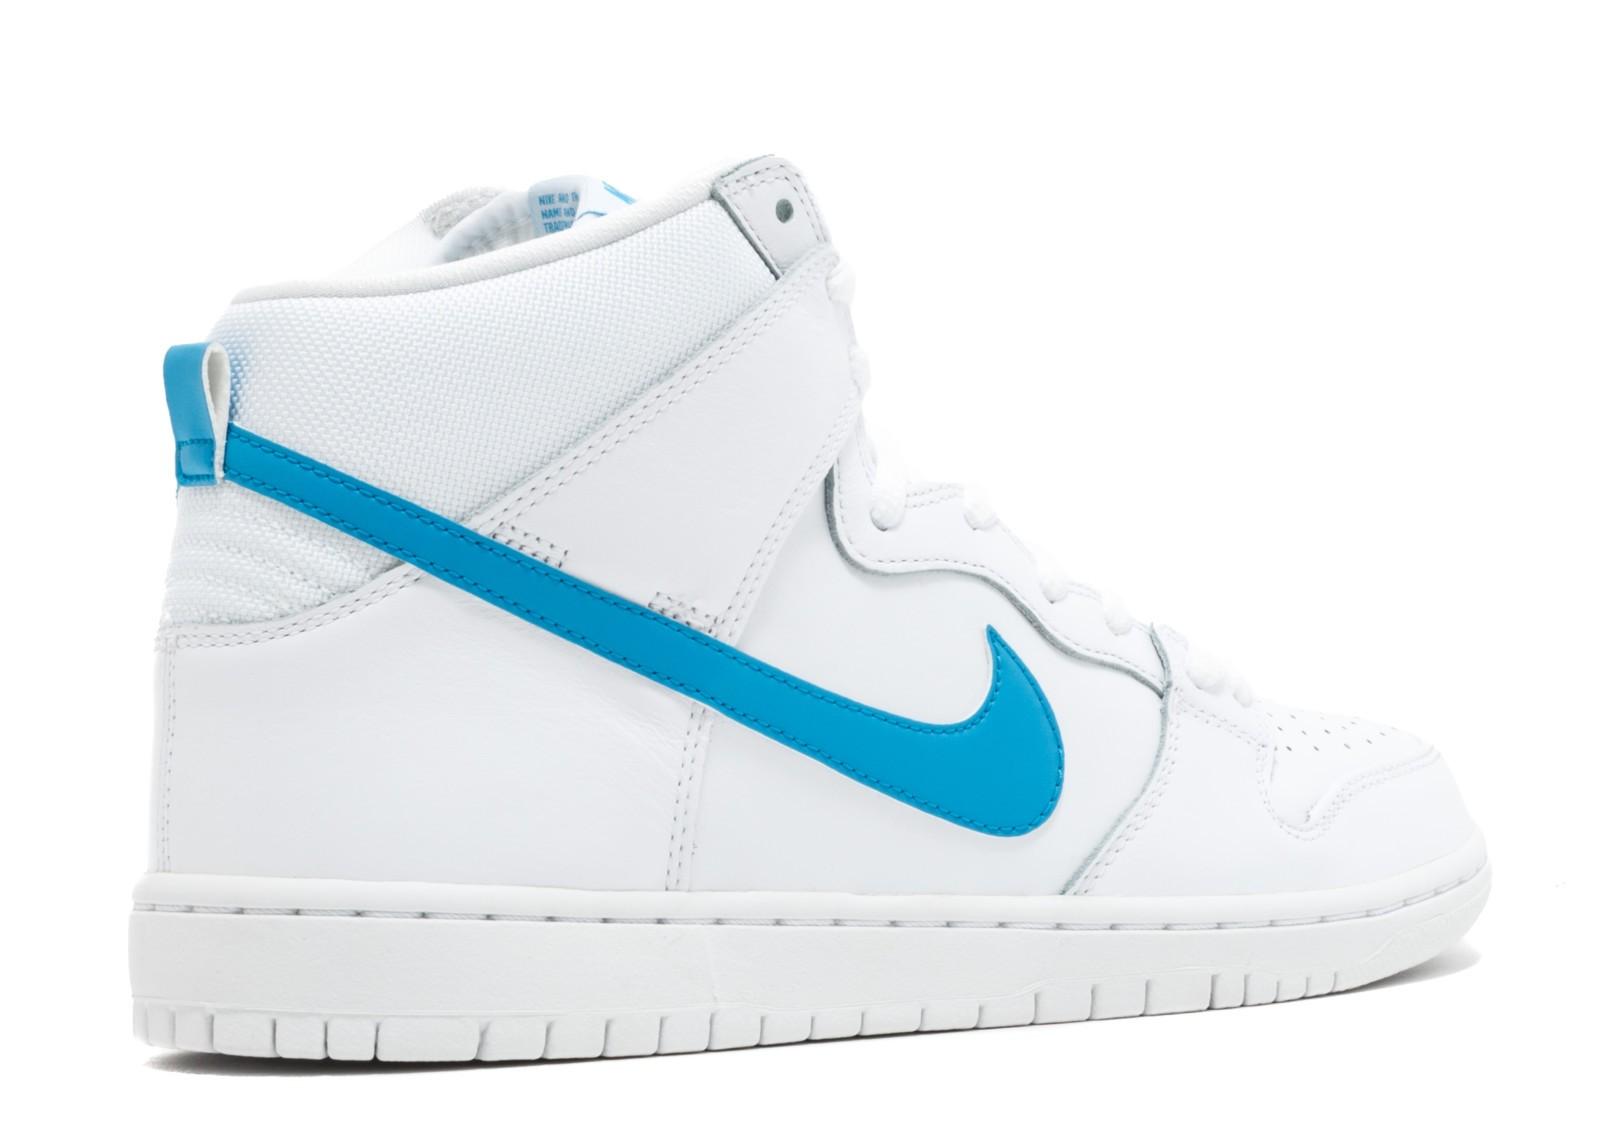 half off 49d1d df4b1 Nike Sb Dunk High Trd Quickstrike Mulder Blue White Orion 881758-141